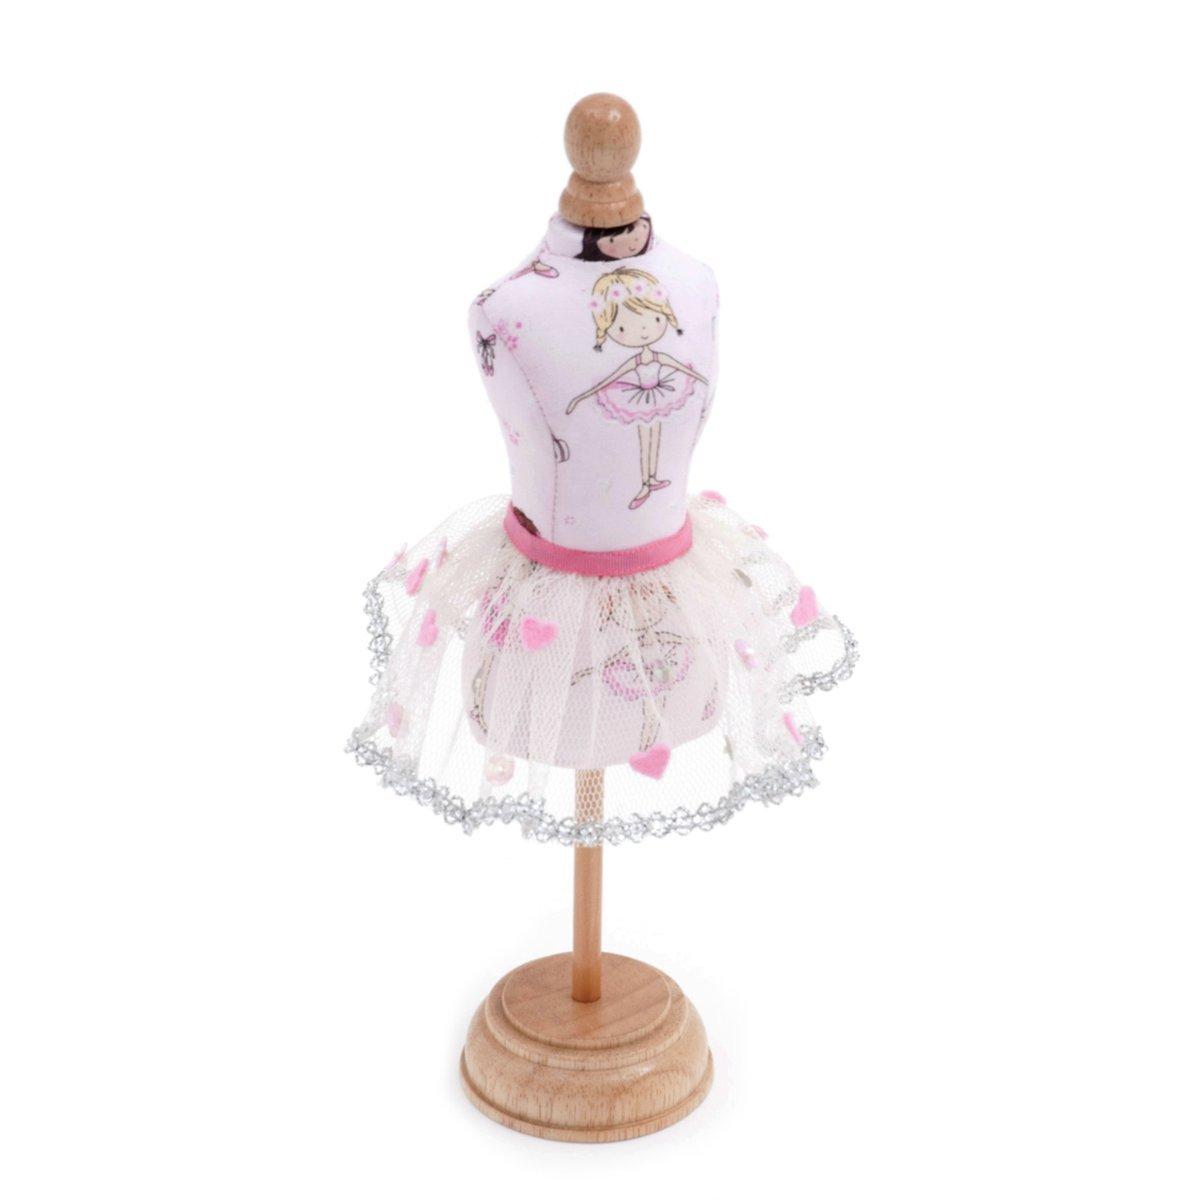 Hobby Gift Novelty Ballerina Dress Form Pin Cushion 7 x 7 x 13cm (d/w/h)